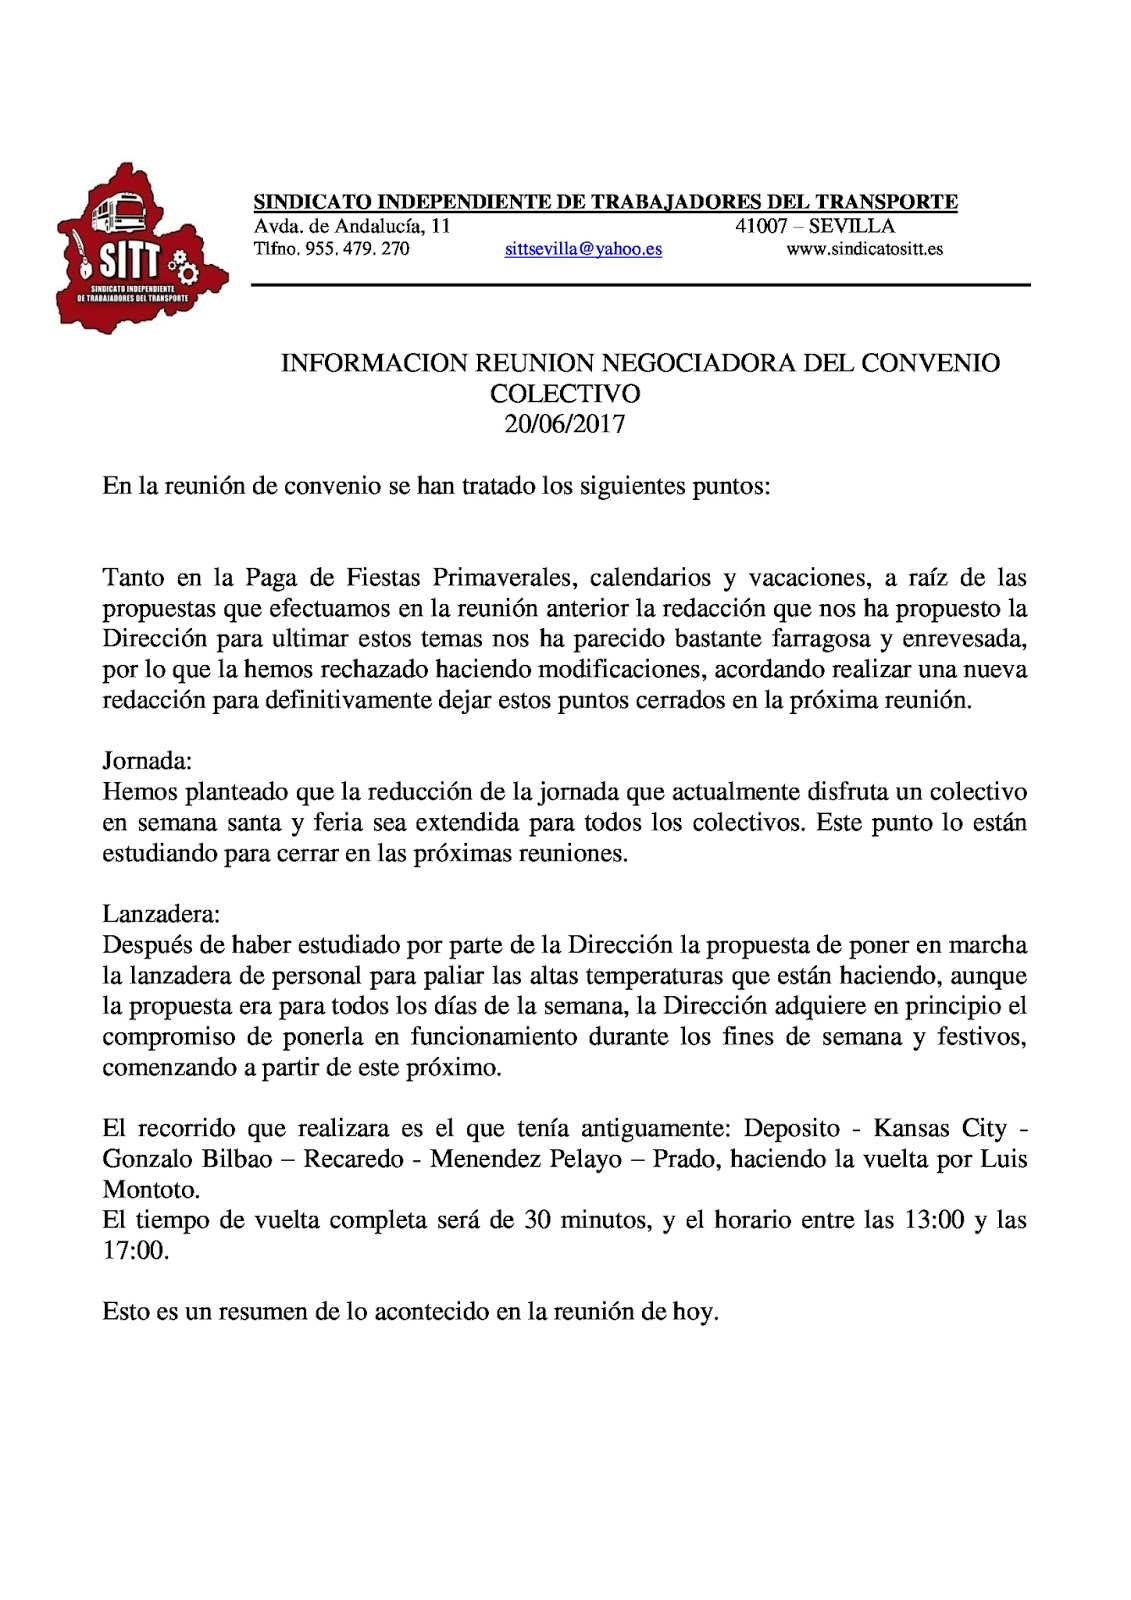 Sitt reunion negociacion de convenio 20 06 17 for Fuera de convenio 2017